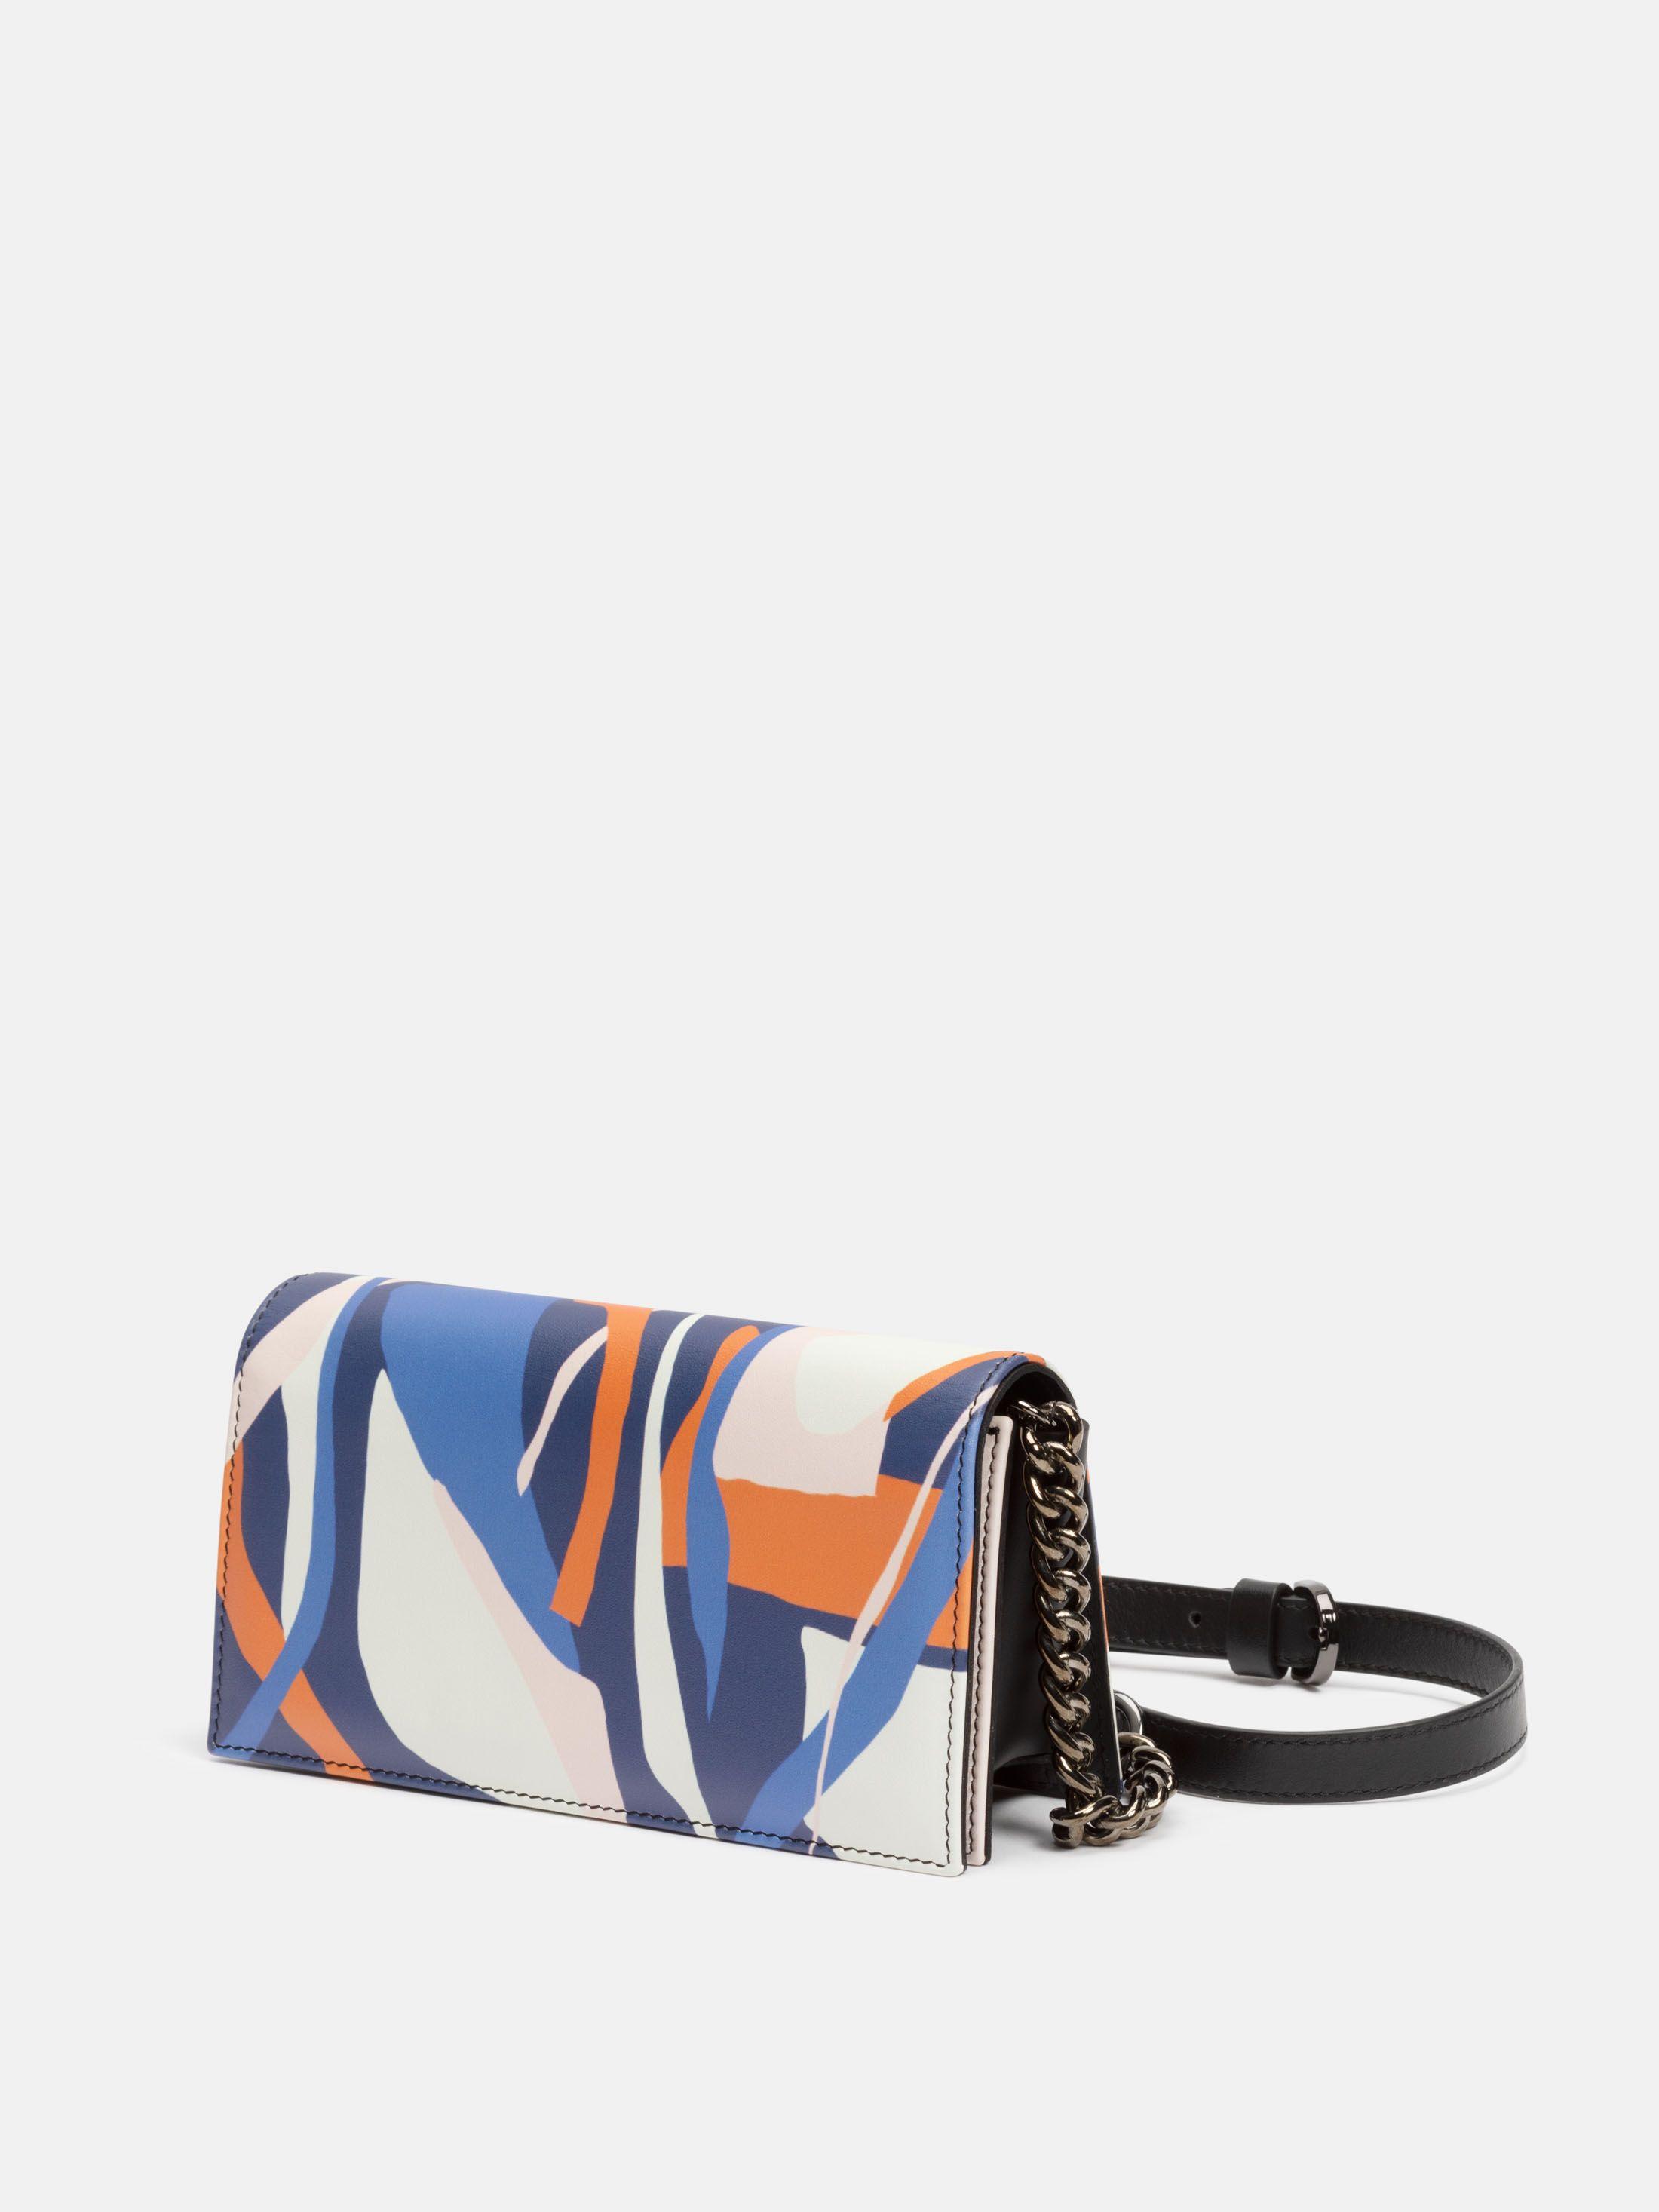 custom oana evening bag nz